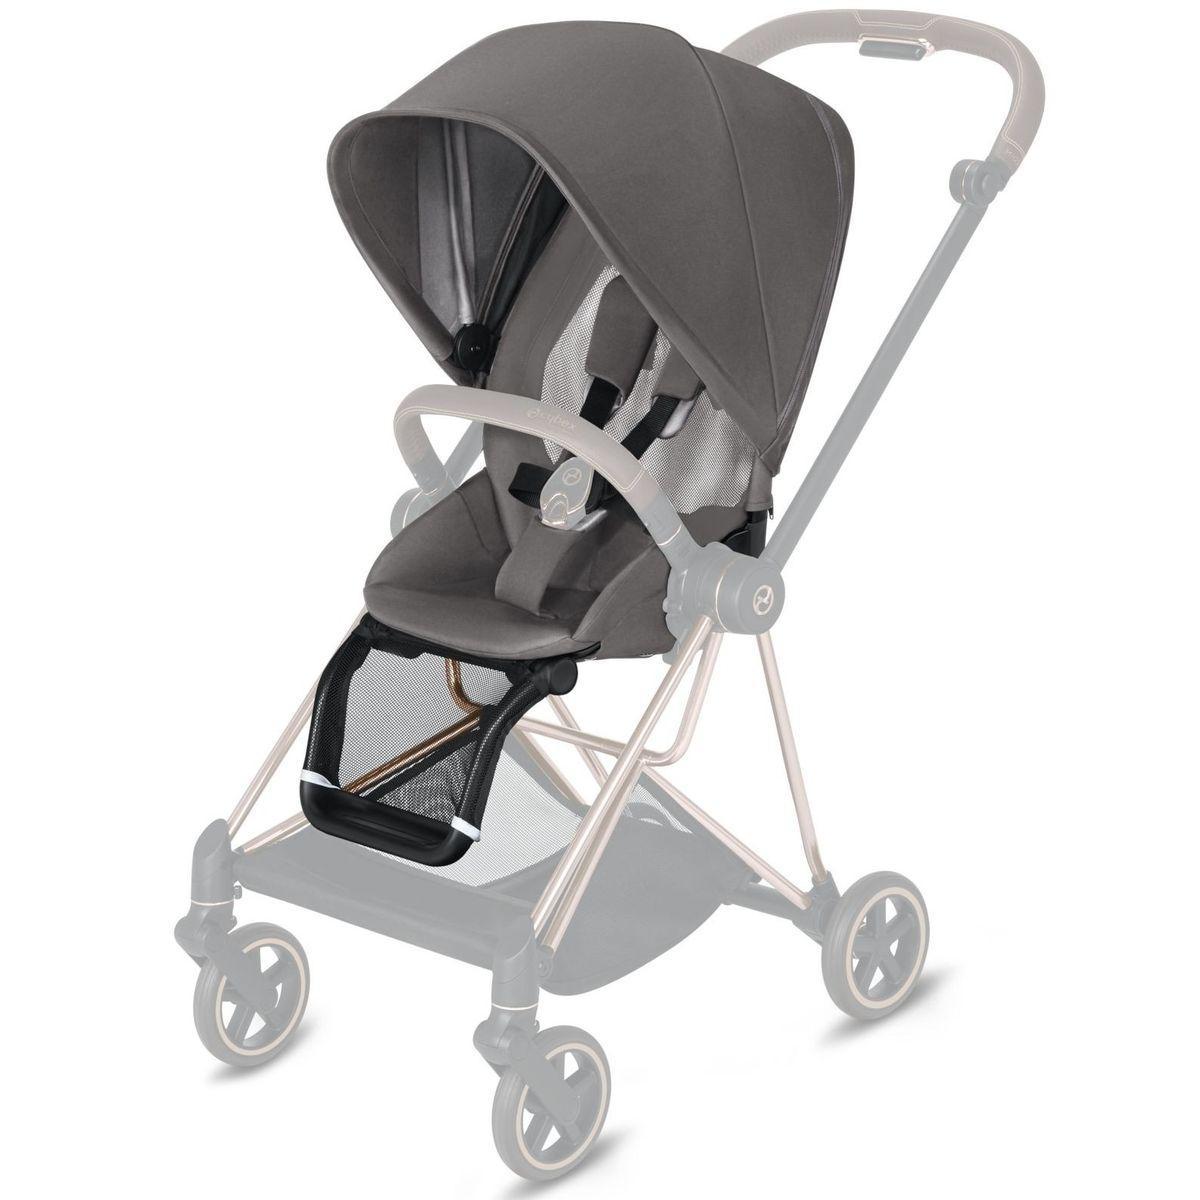 Asiento-pack silla MIOS Cybex manhattan grey-mid grey